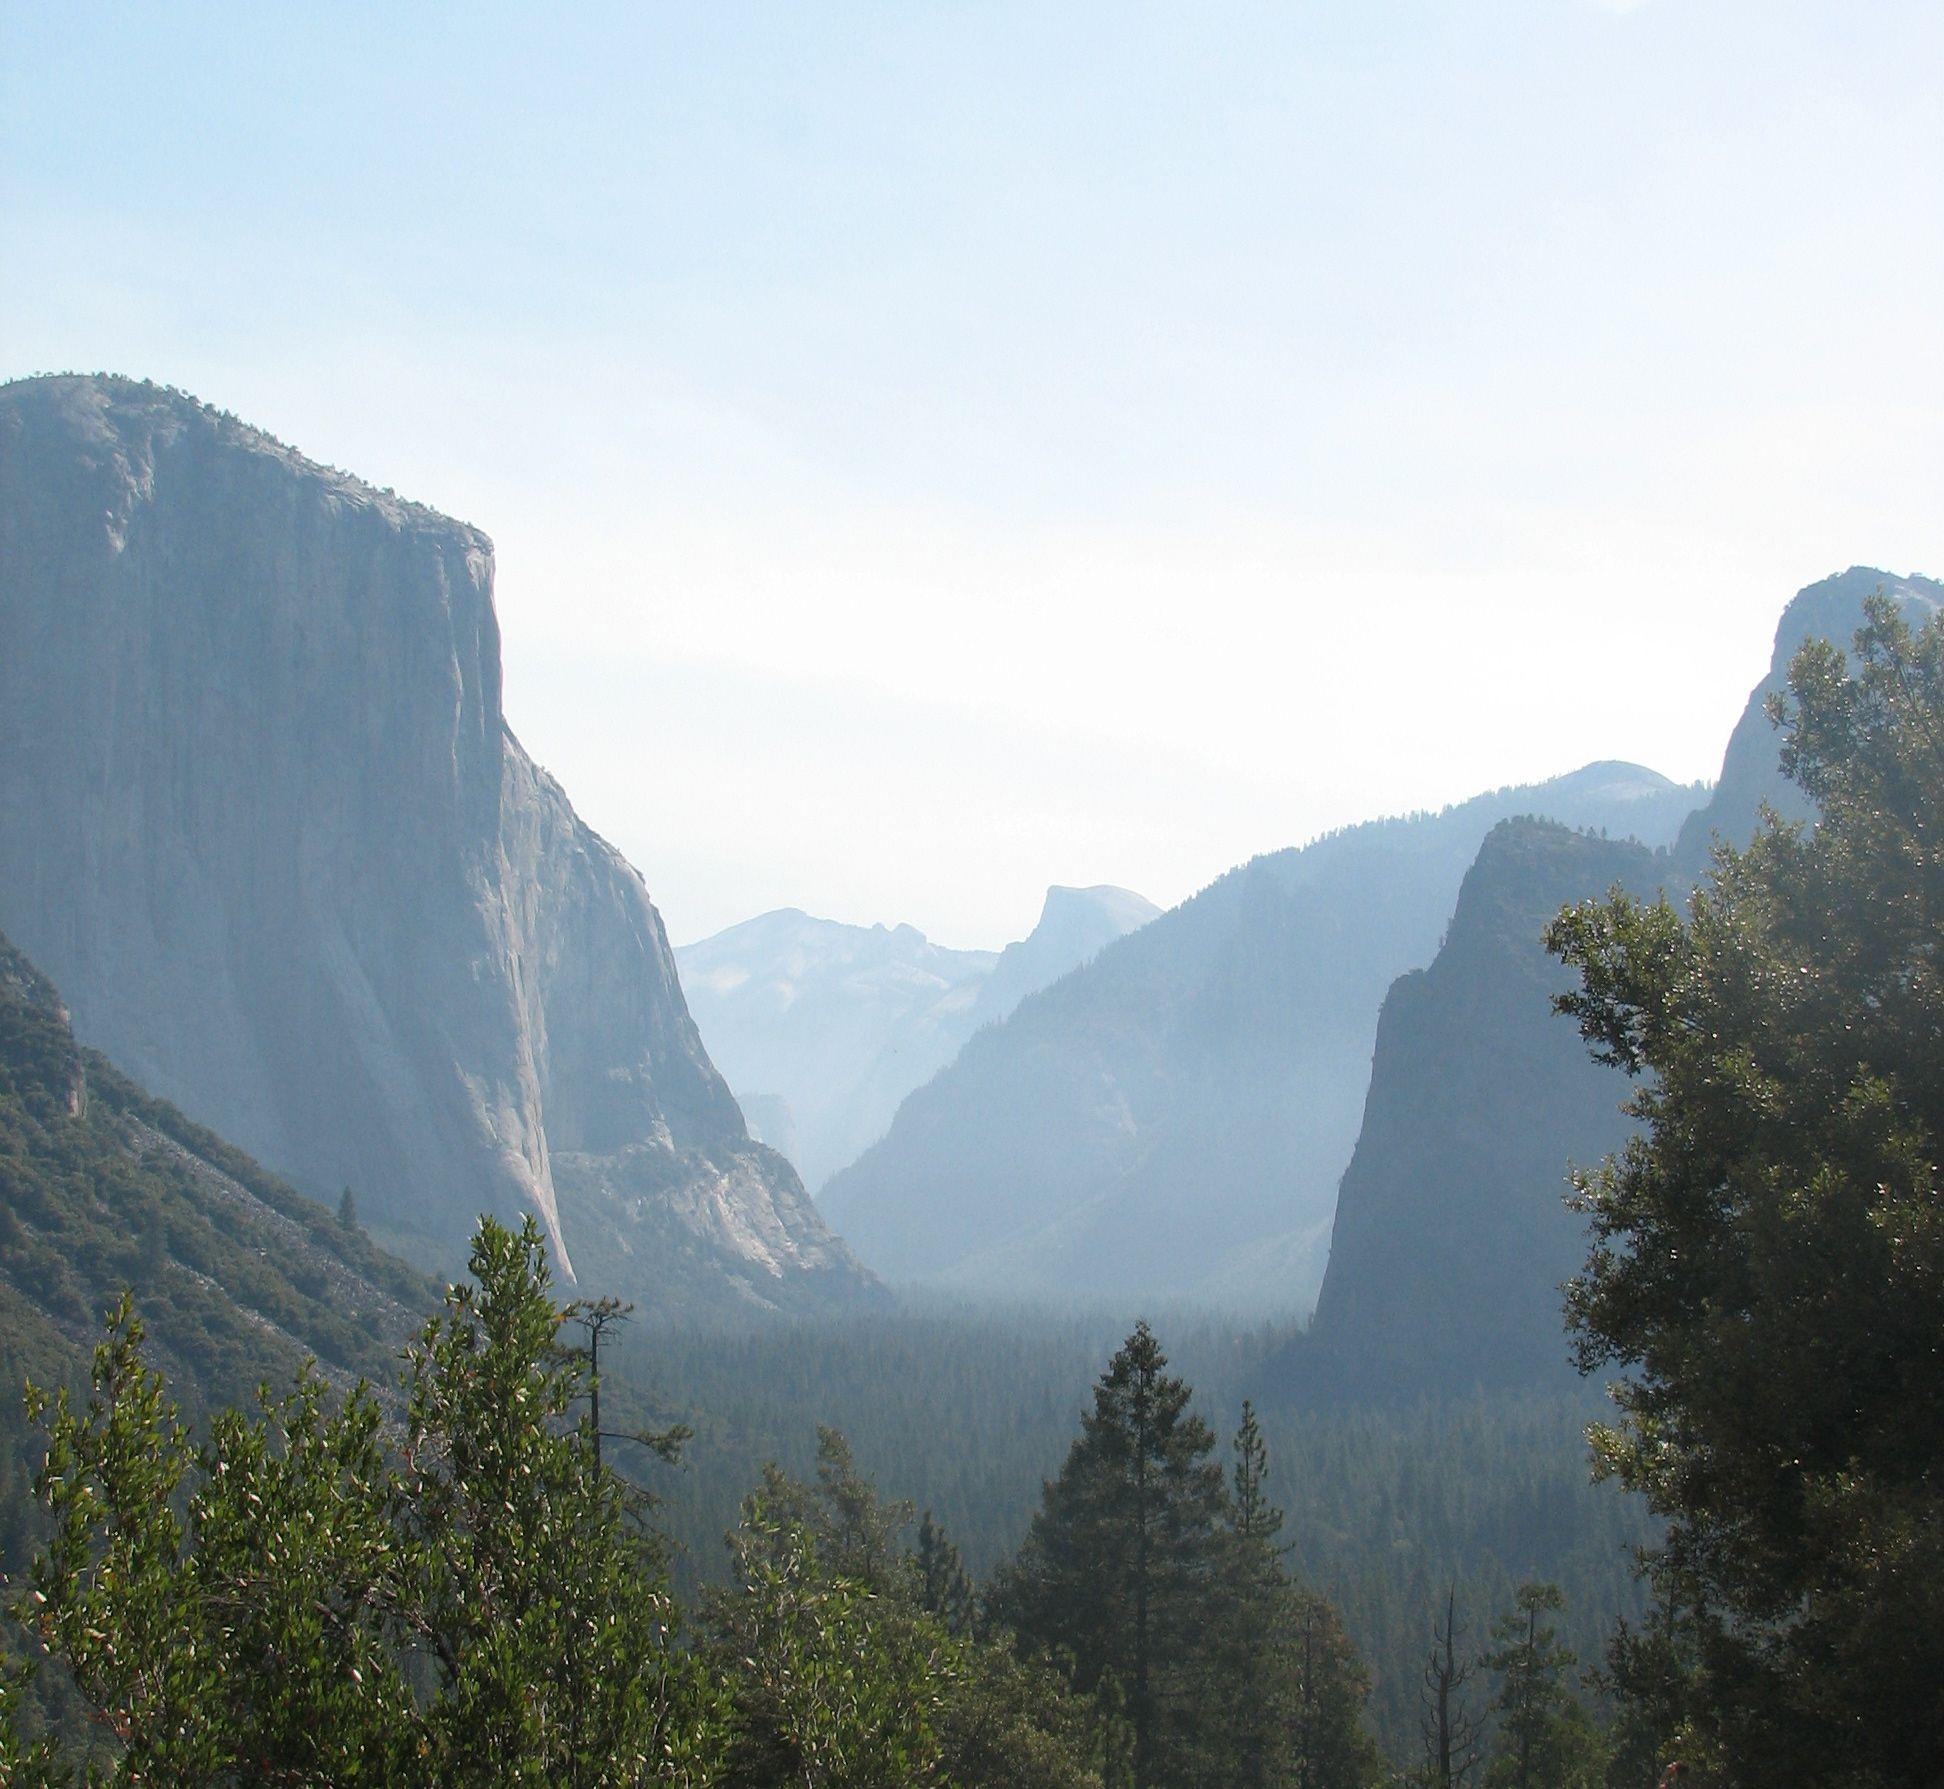 Yosemite National Park Vacations: Tunnel View, Yosemite Park